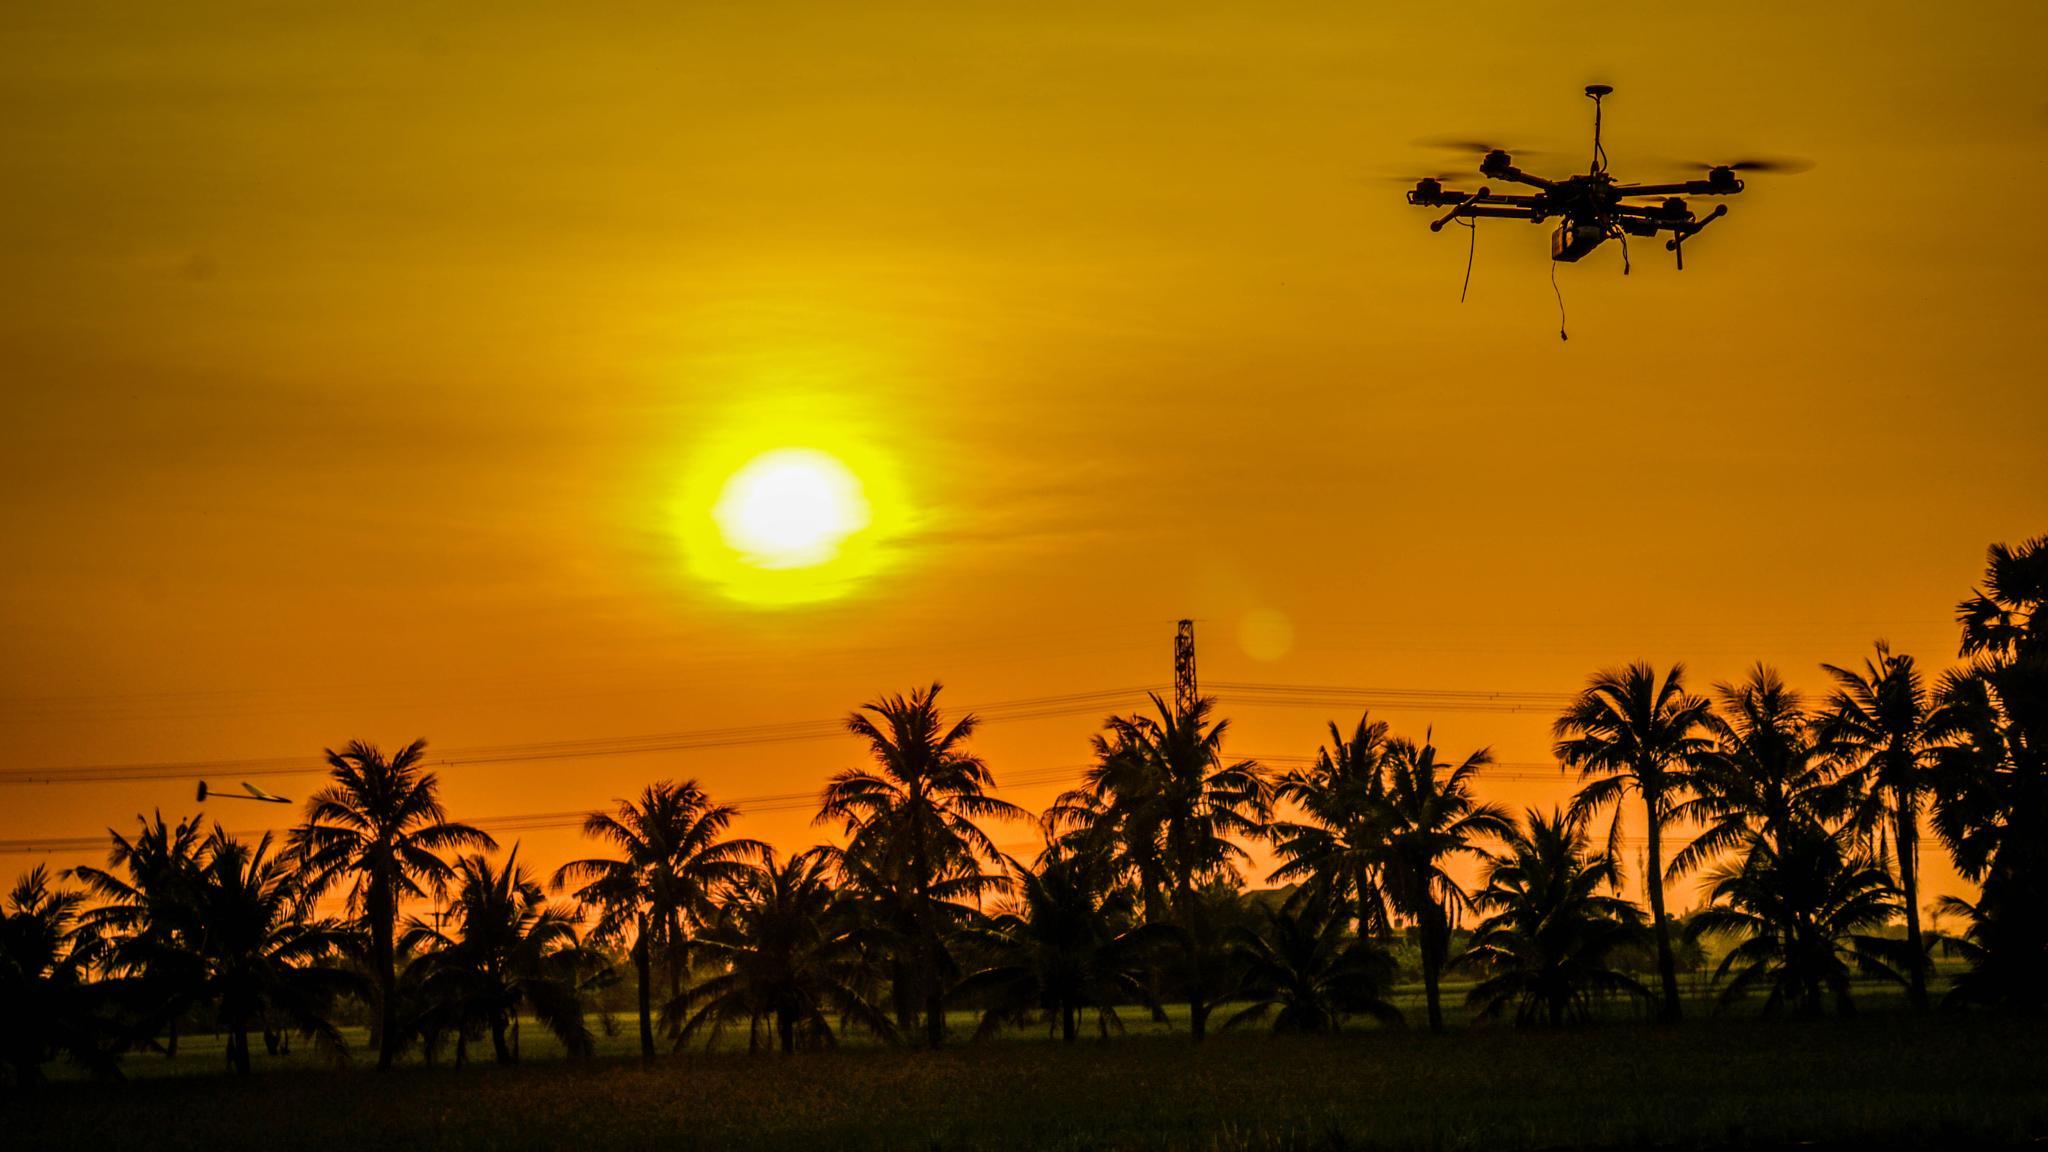 Drone by Sarayuth Golfhaha